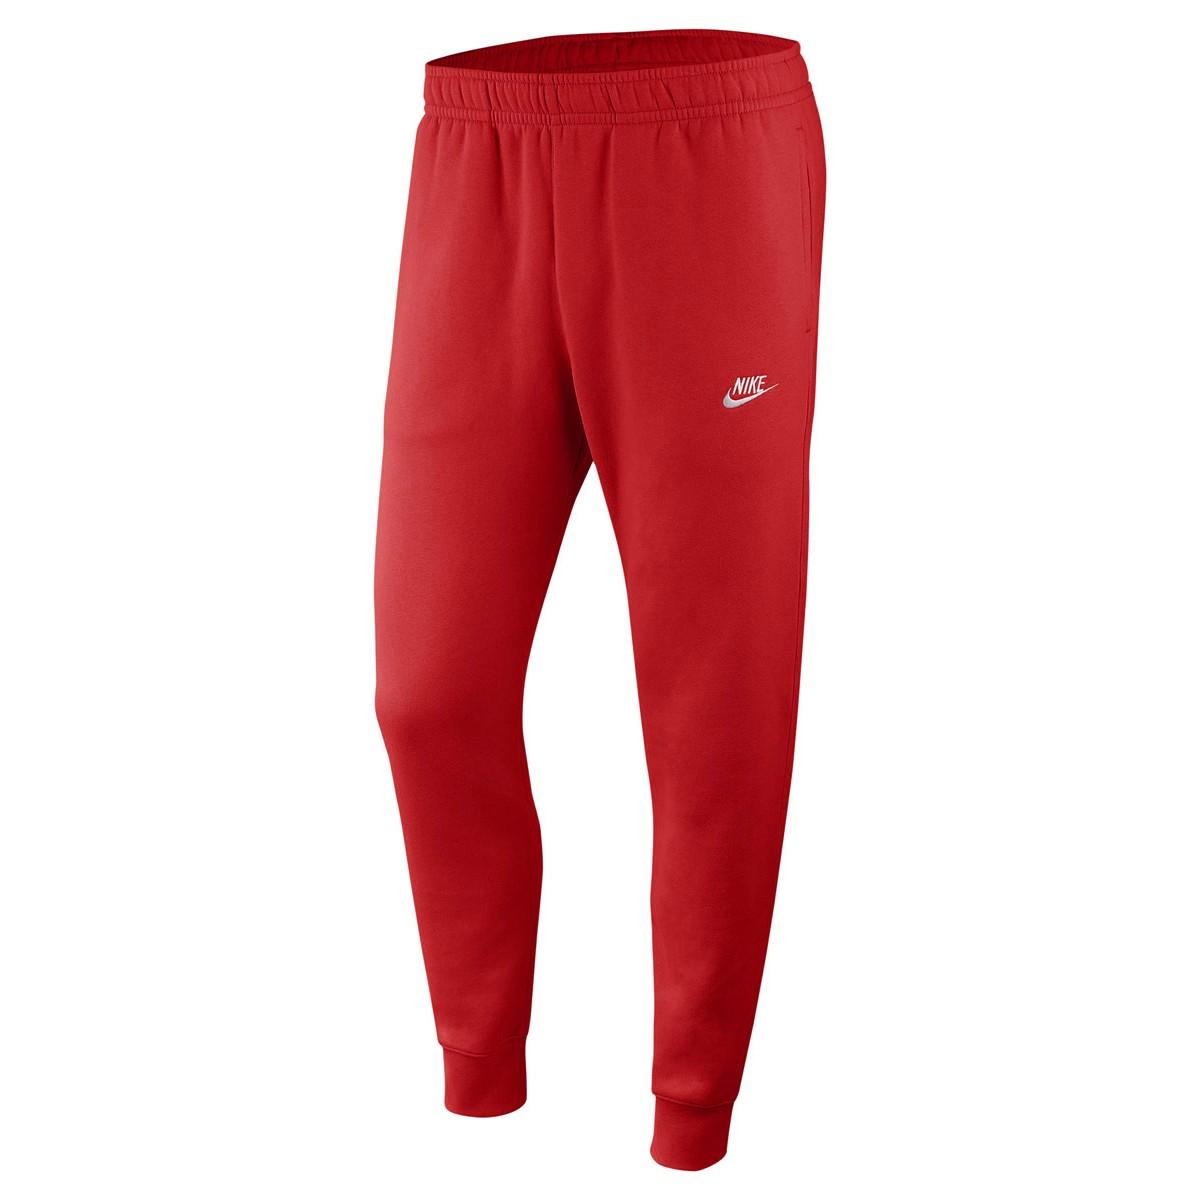 pantalon nike rouge homme